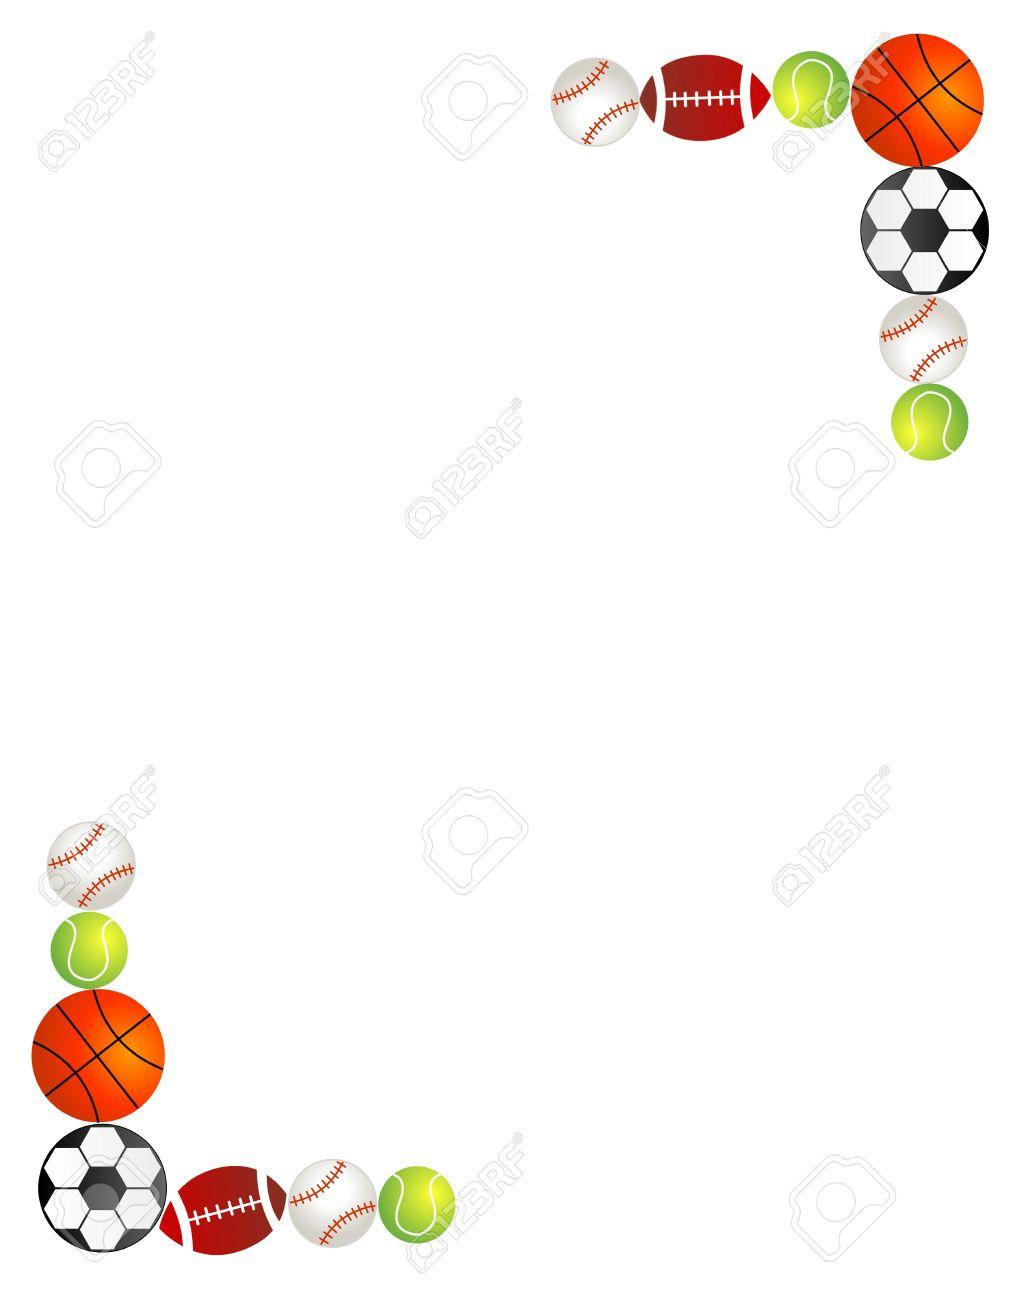 2adade99dc7 Five different sport balls border   frame on white background. Stock Vector  - 38547554